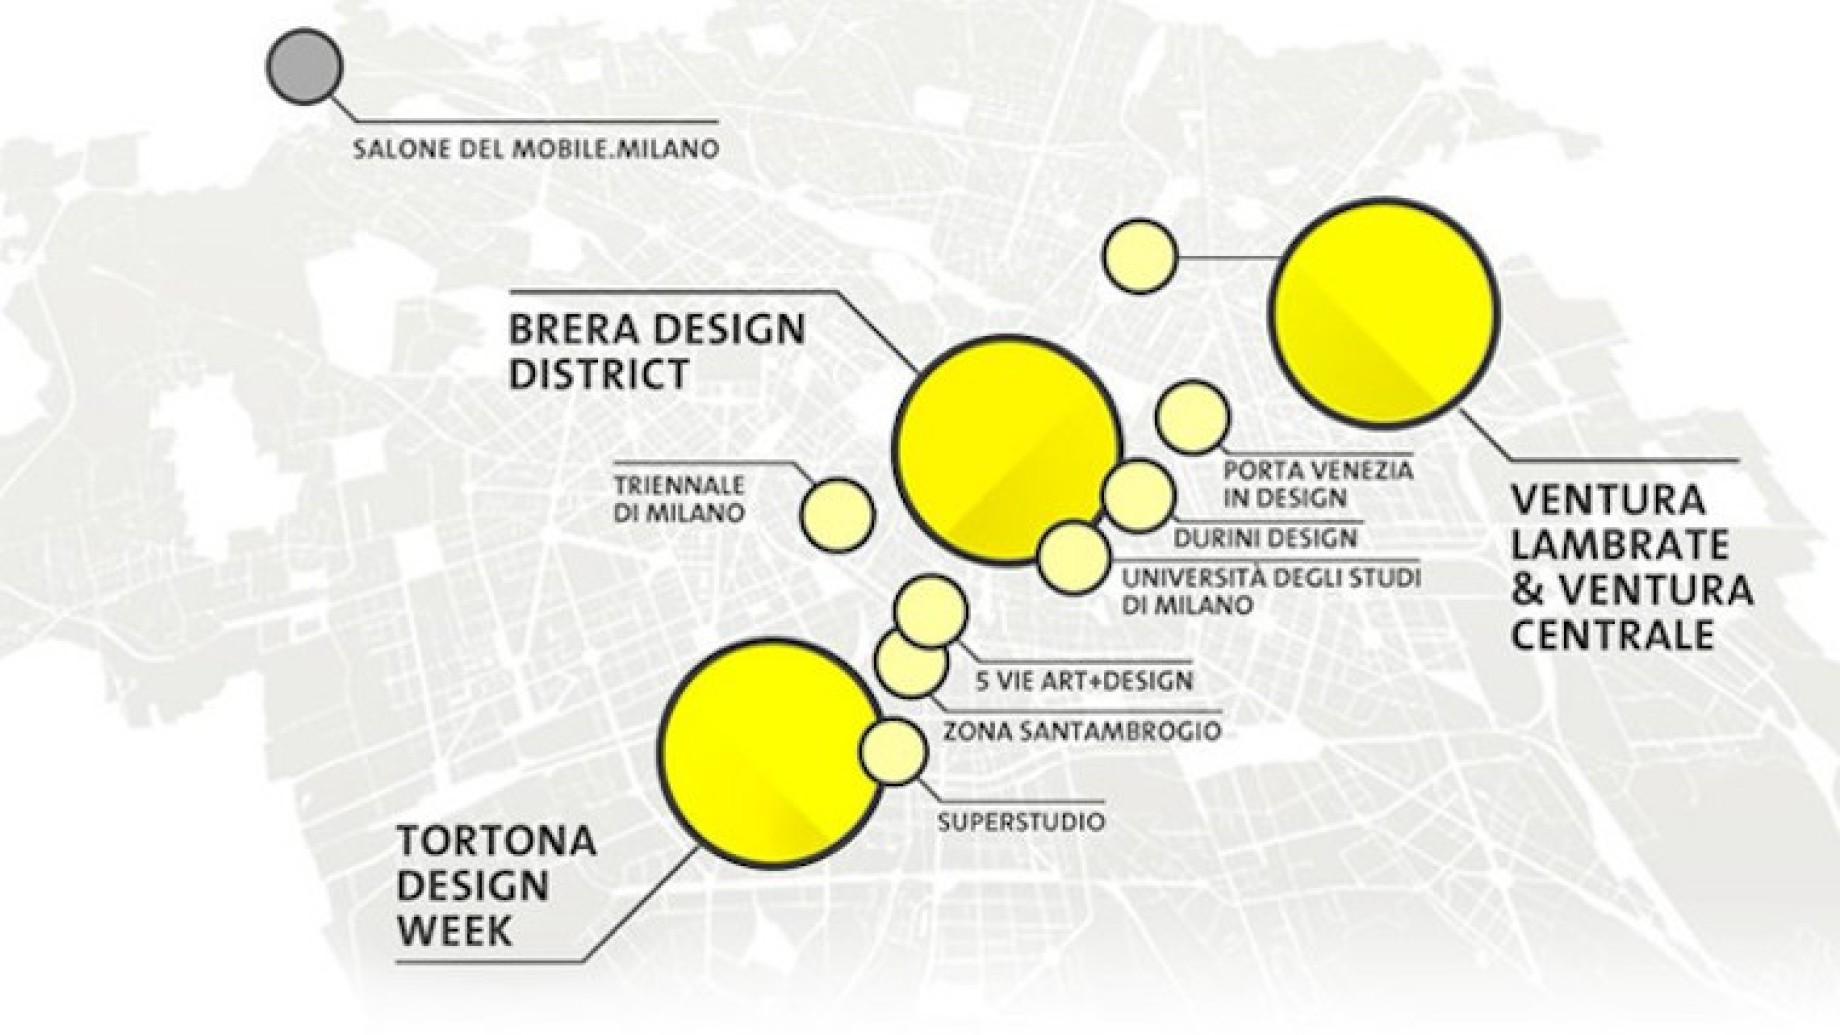 design-week-mappa-fuorisalone